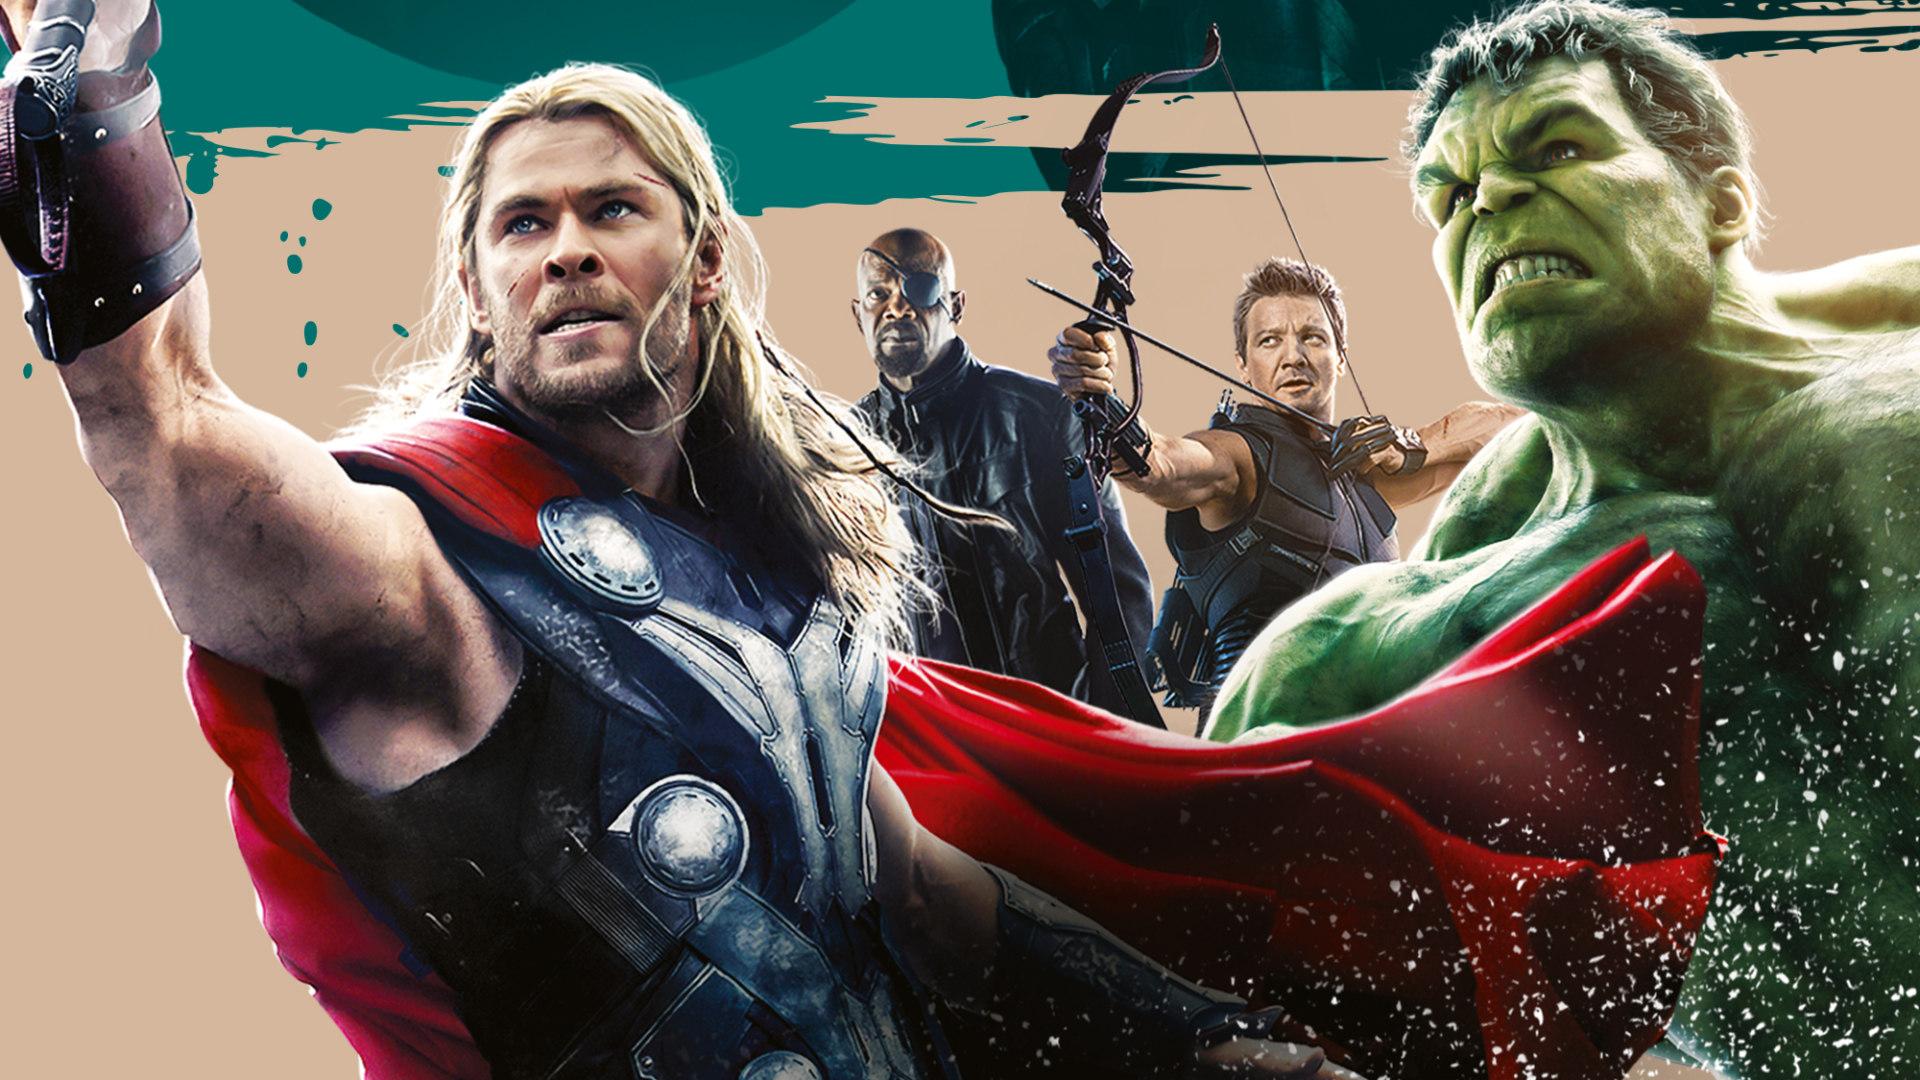 avengers age of ultron full movie stream free